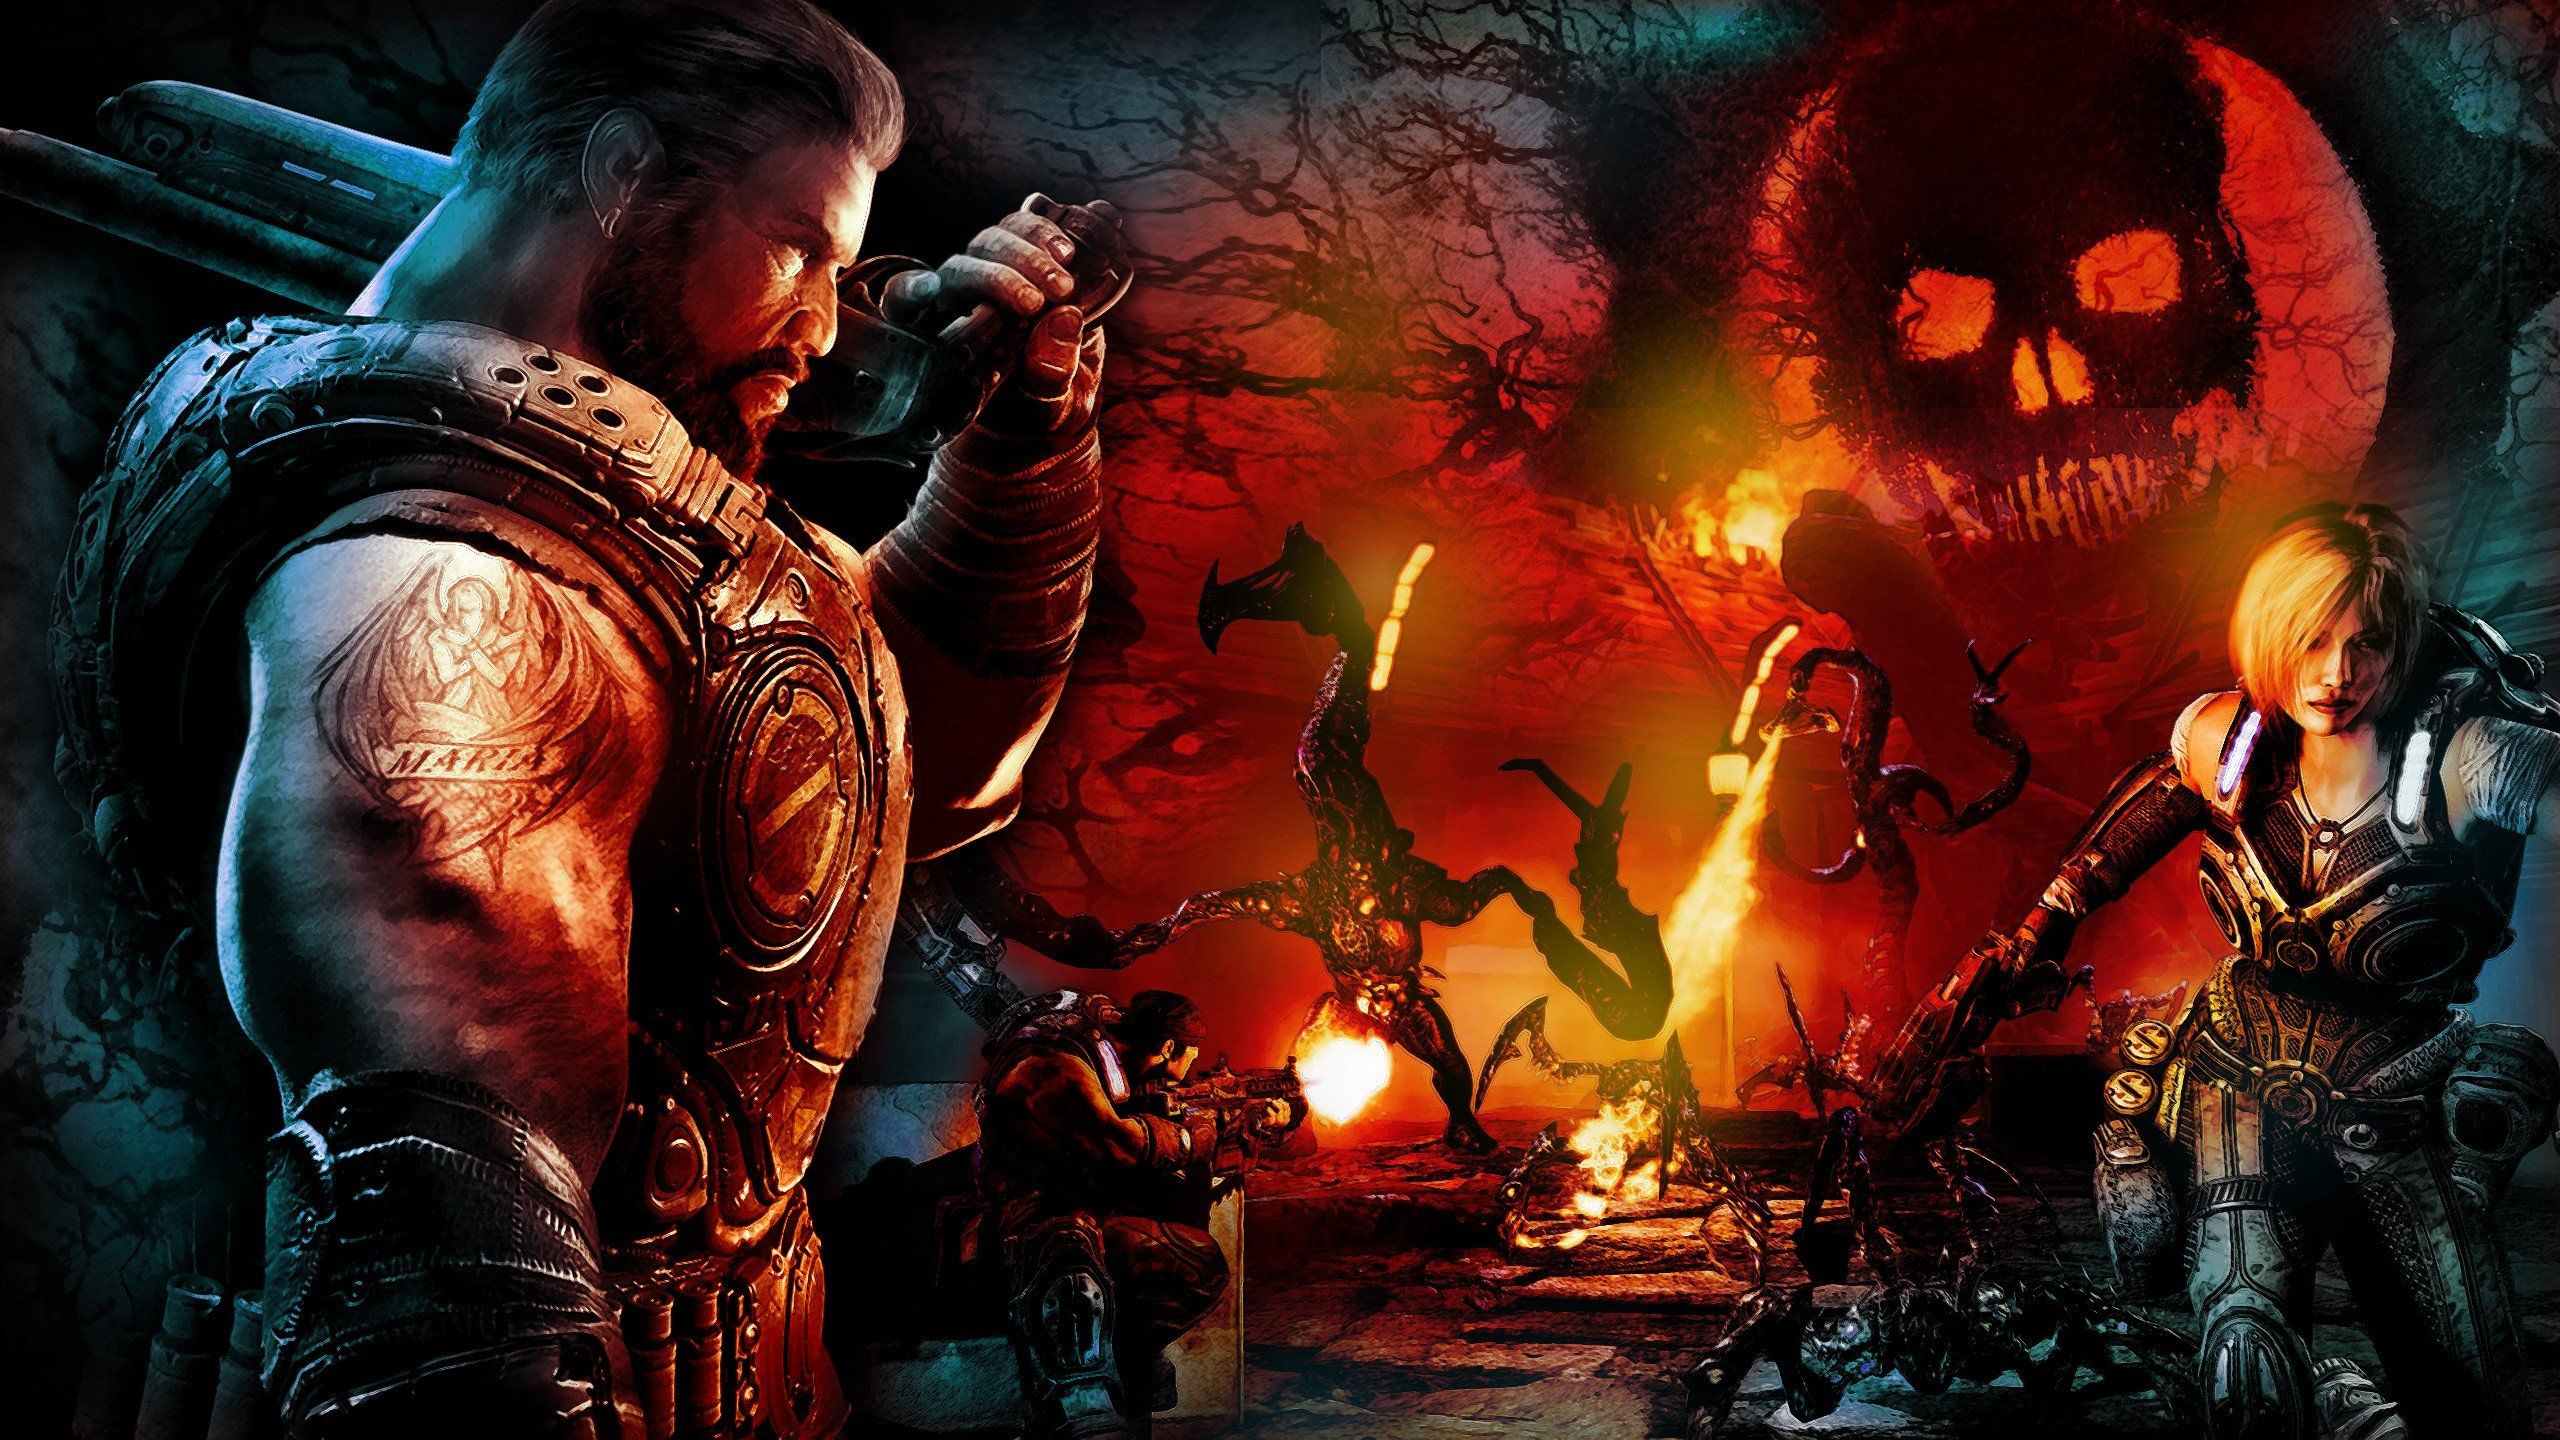 Gears Of War Wallpaper 640x960 3 Backgrounds 38 Wallpapers